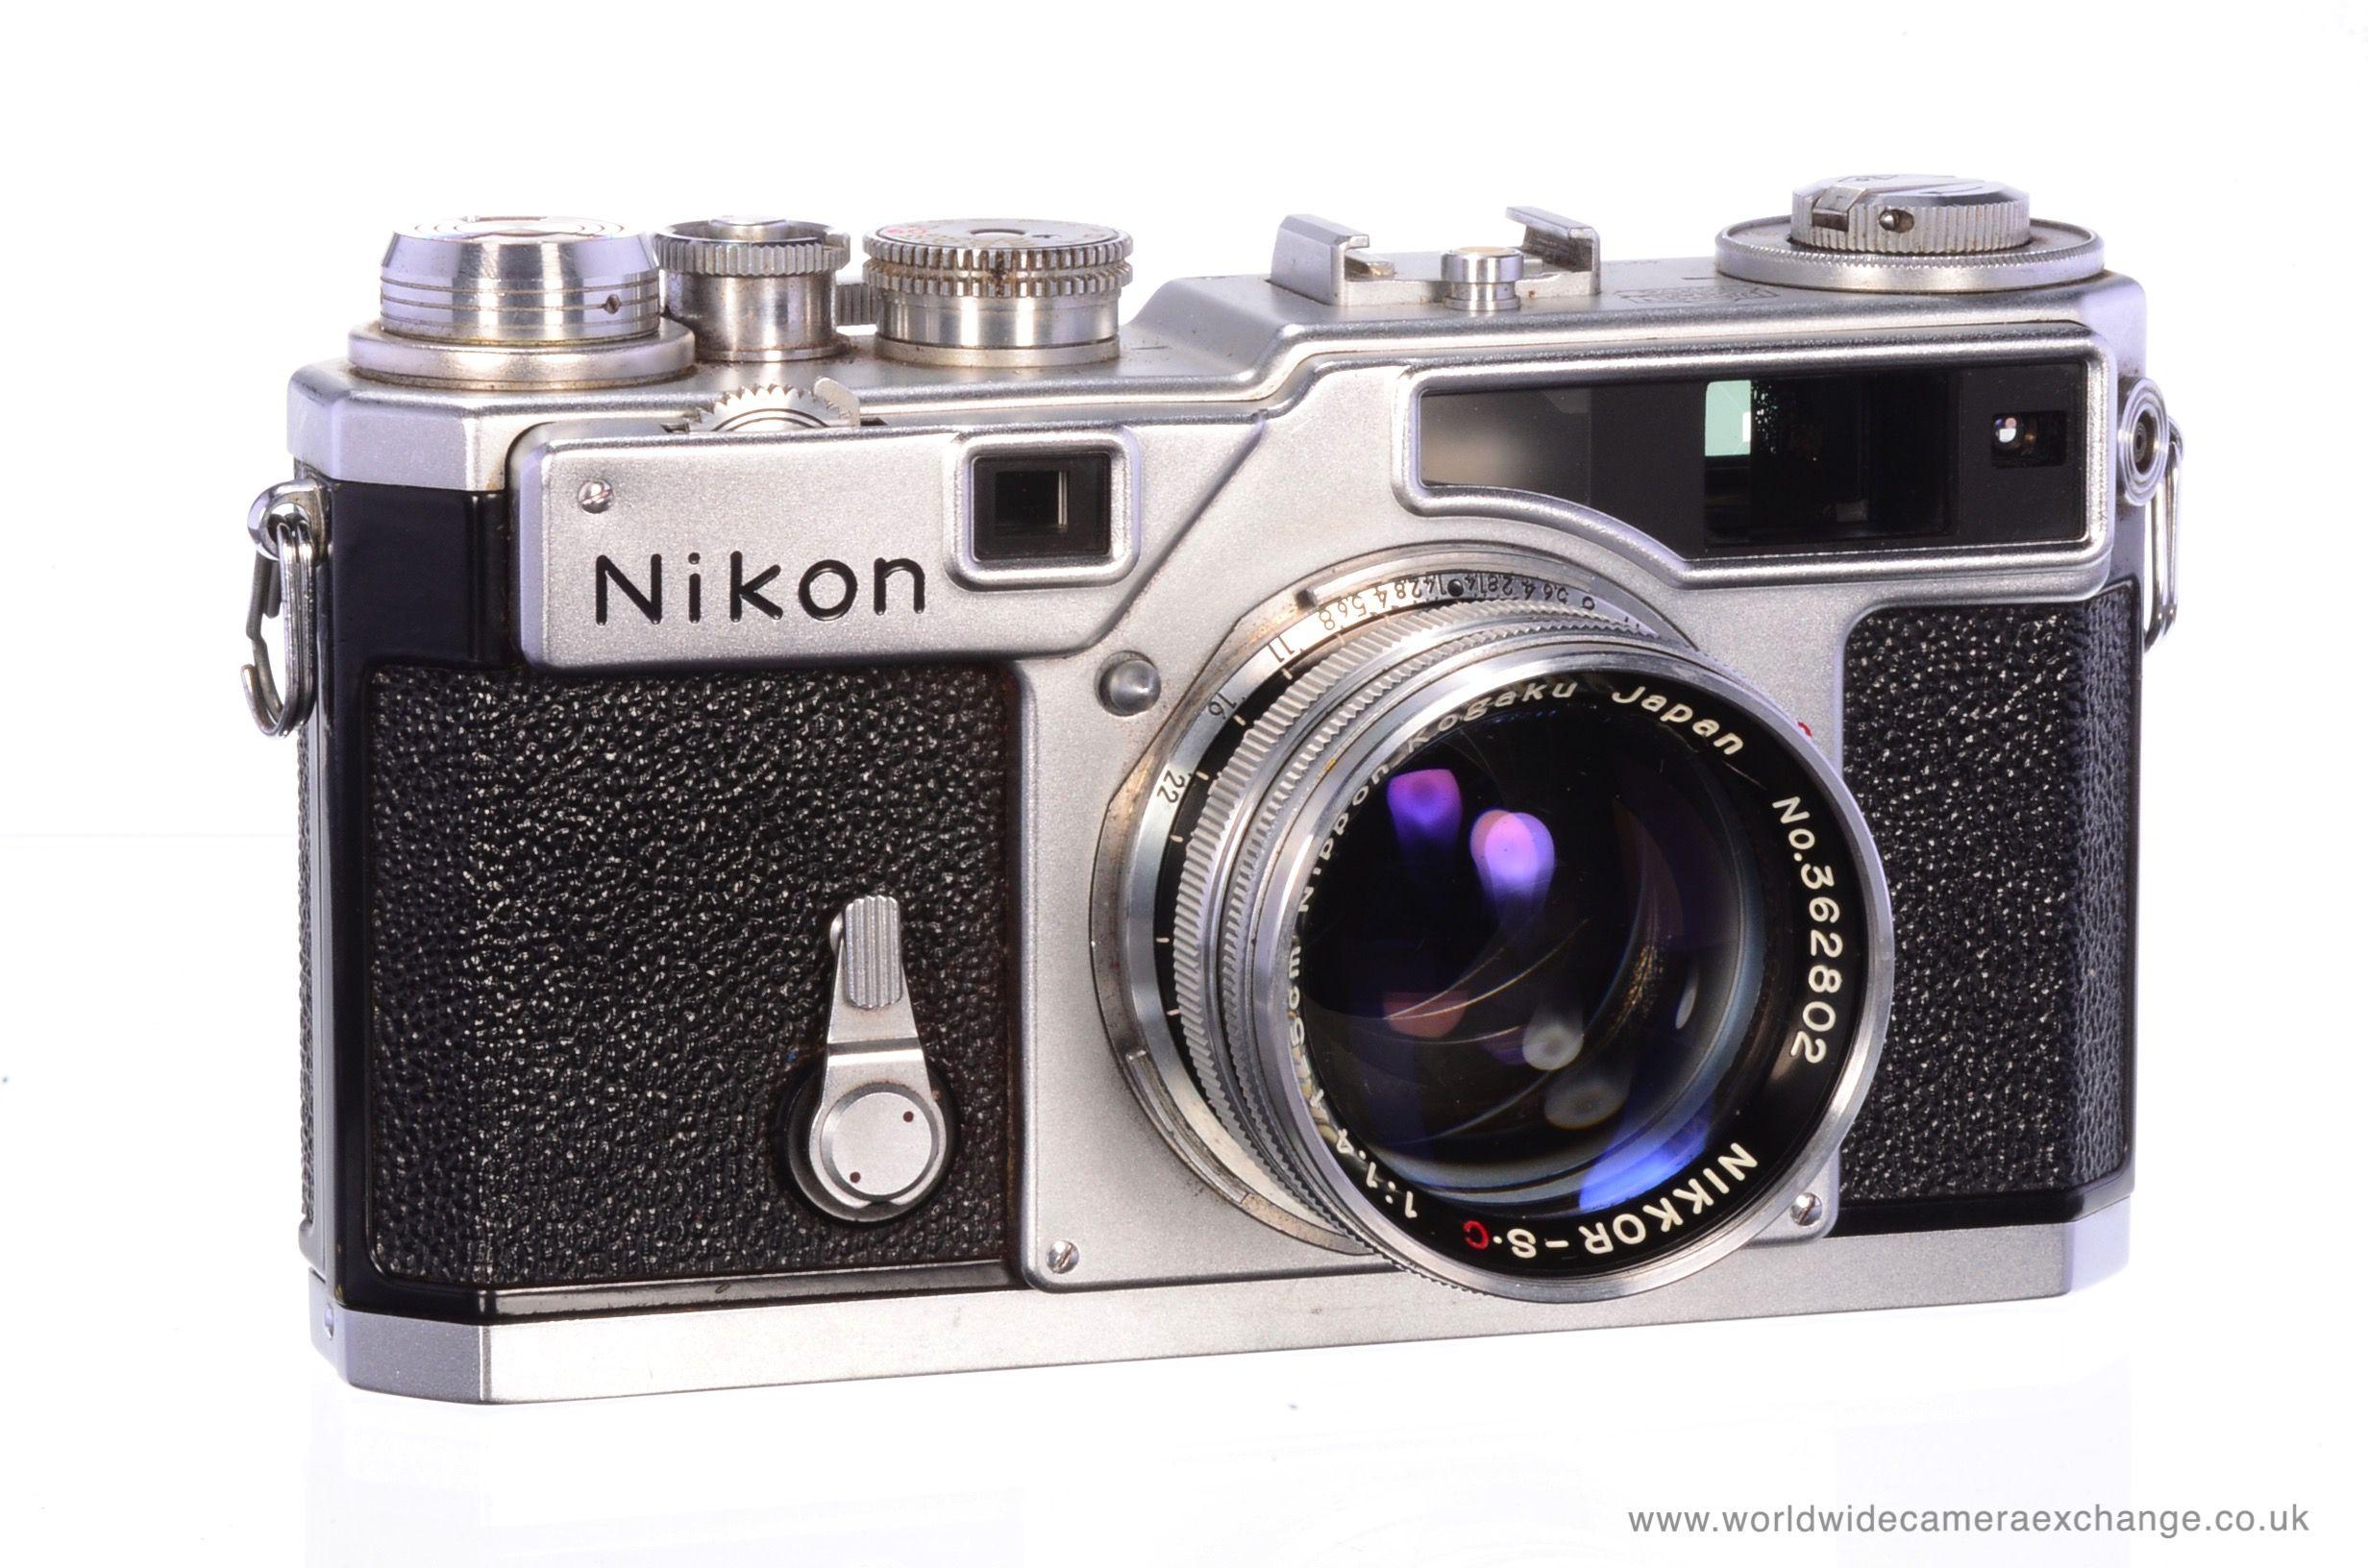 Nikon SP   Photography equipment. Leica. Camera